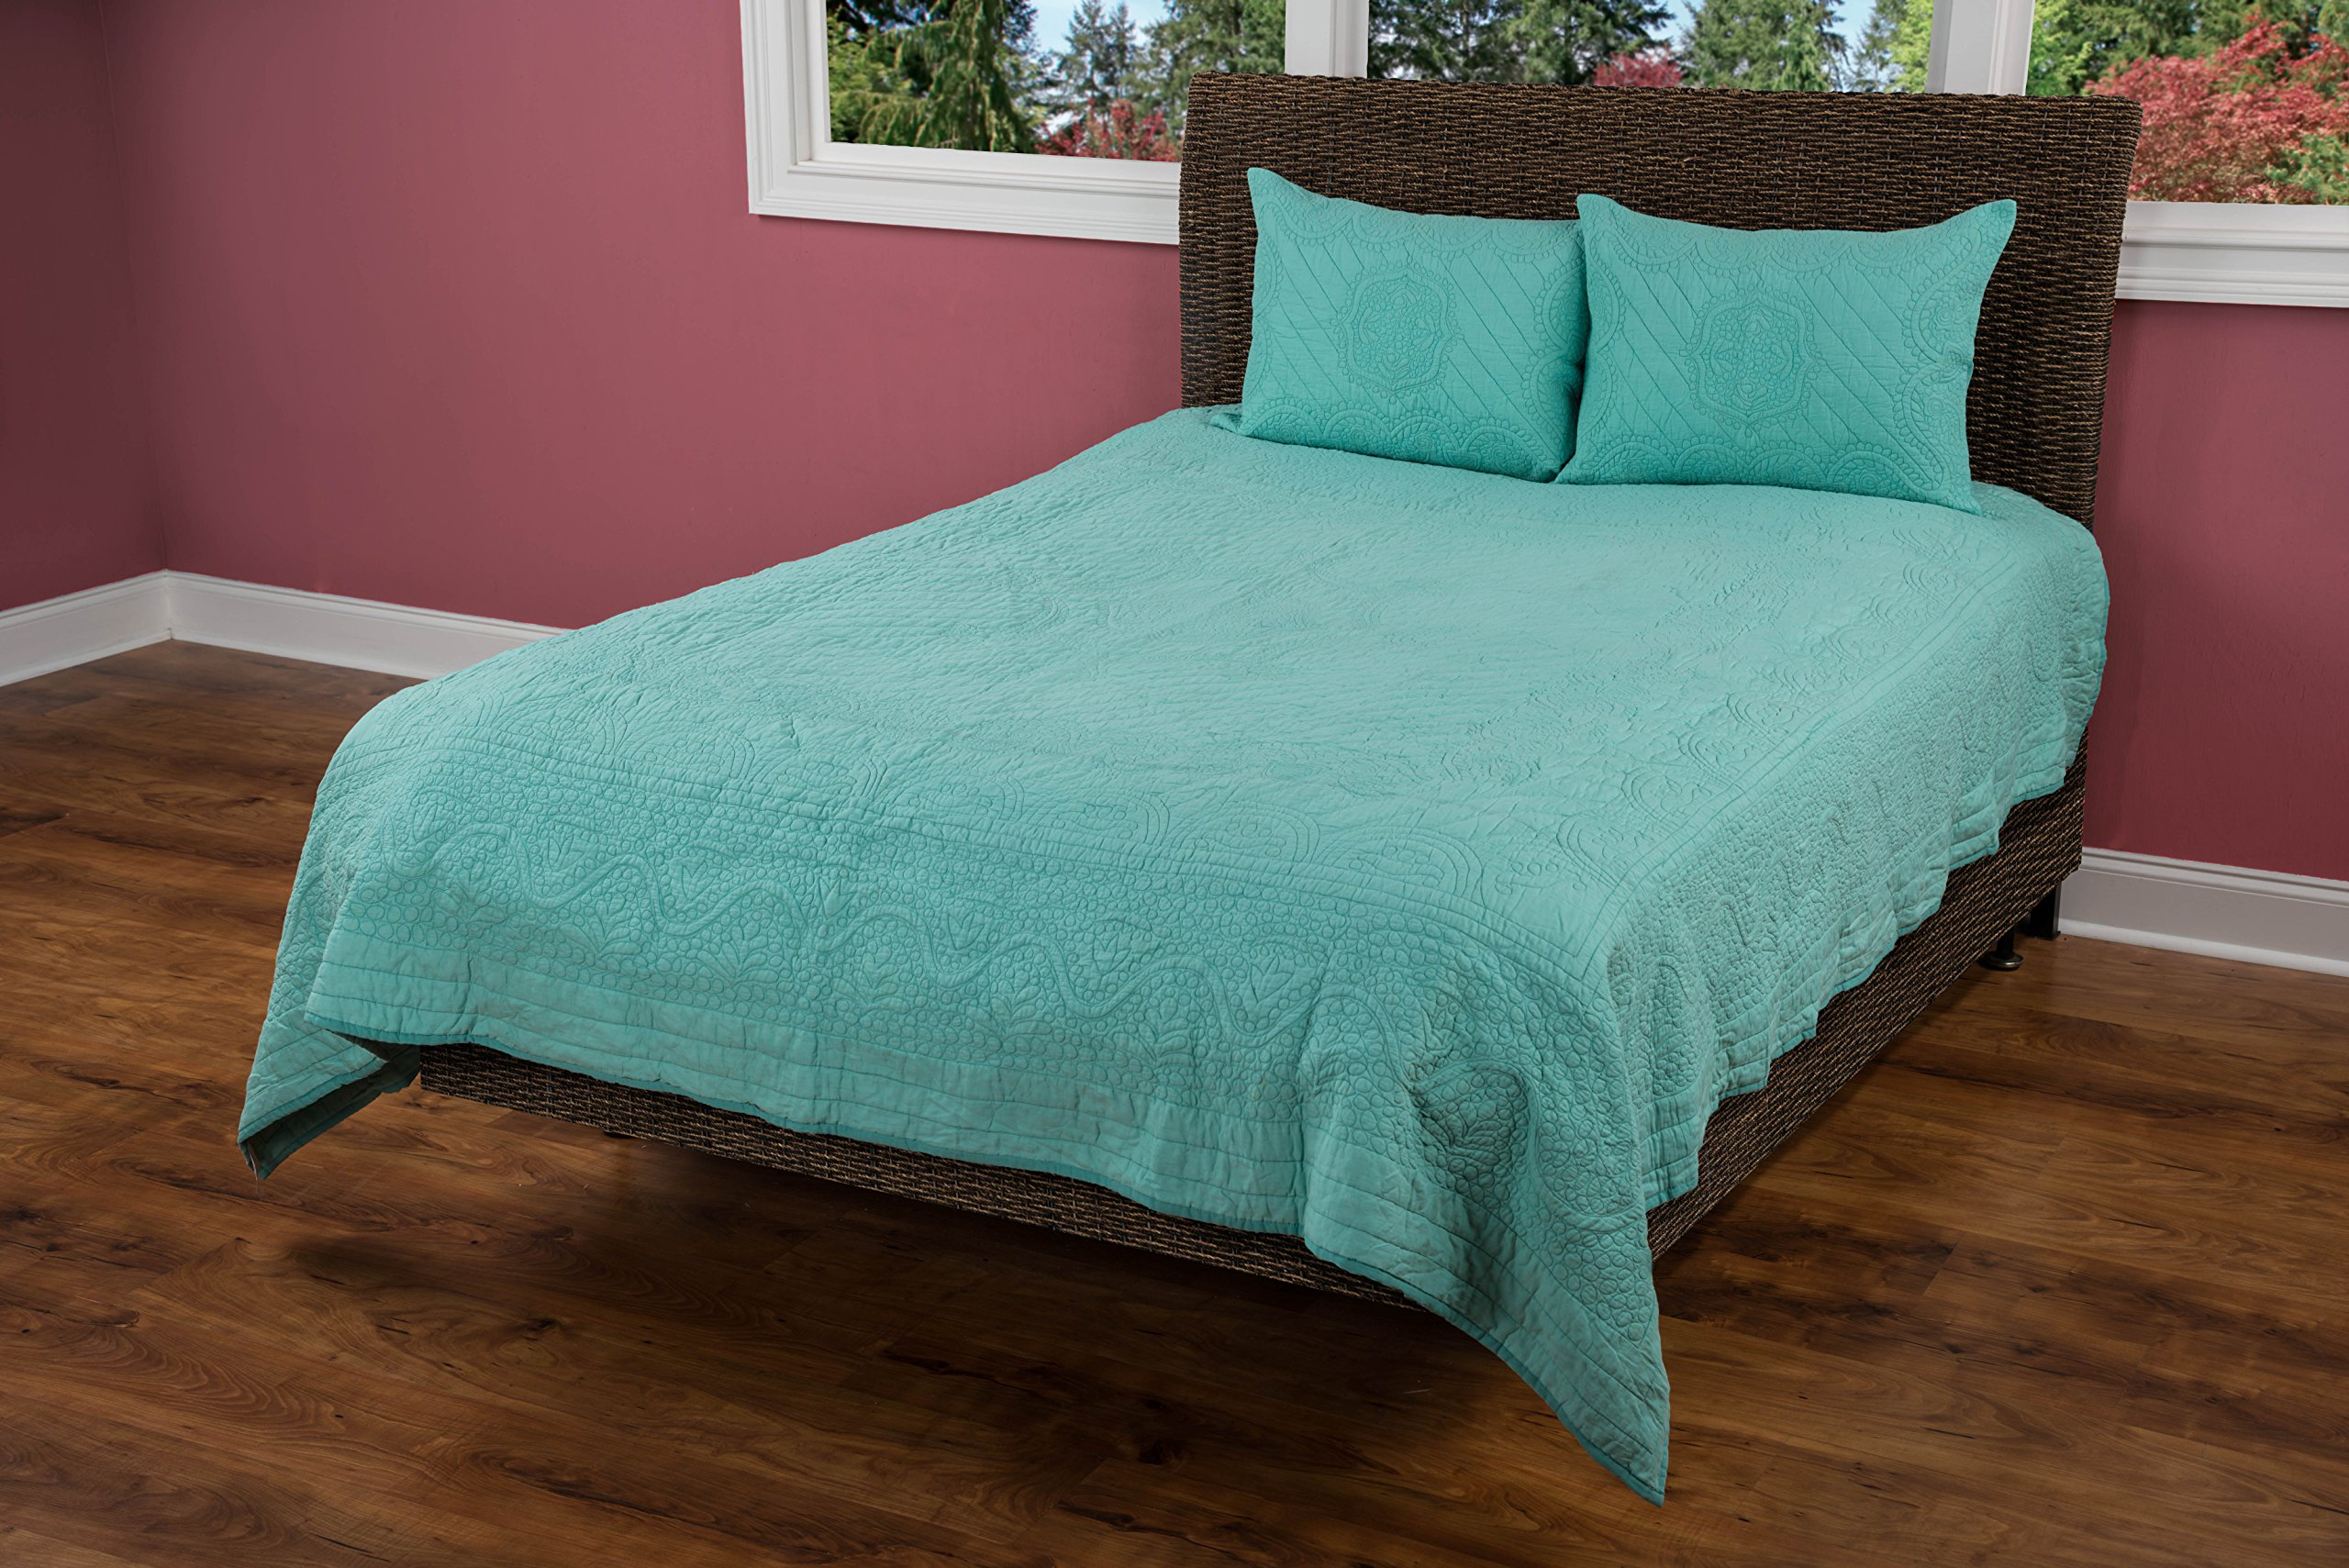 Rizzy Home QLTBT1793AA001692 Moroccan Fling Quilt,Aqua,King